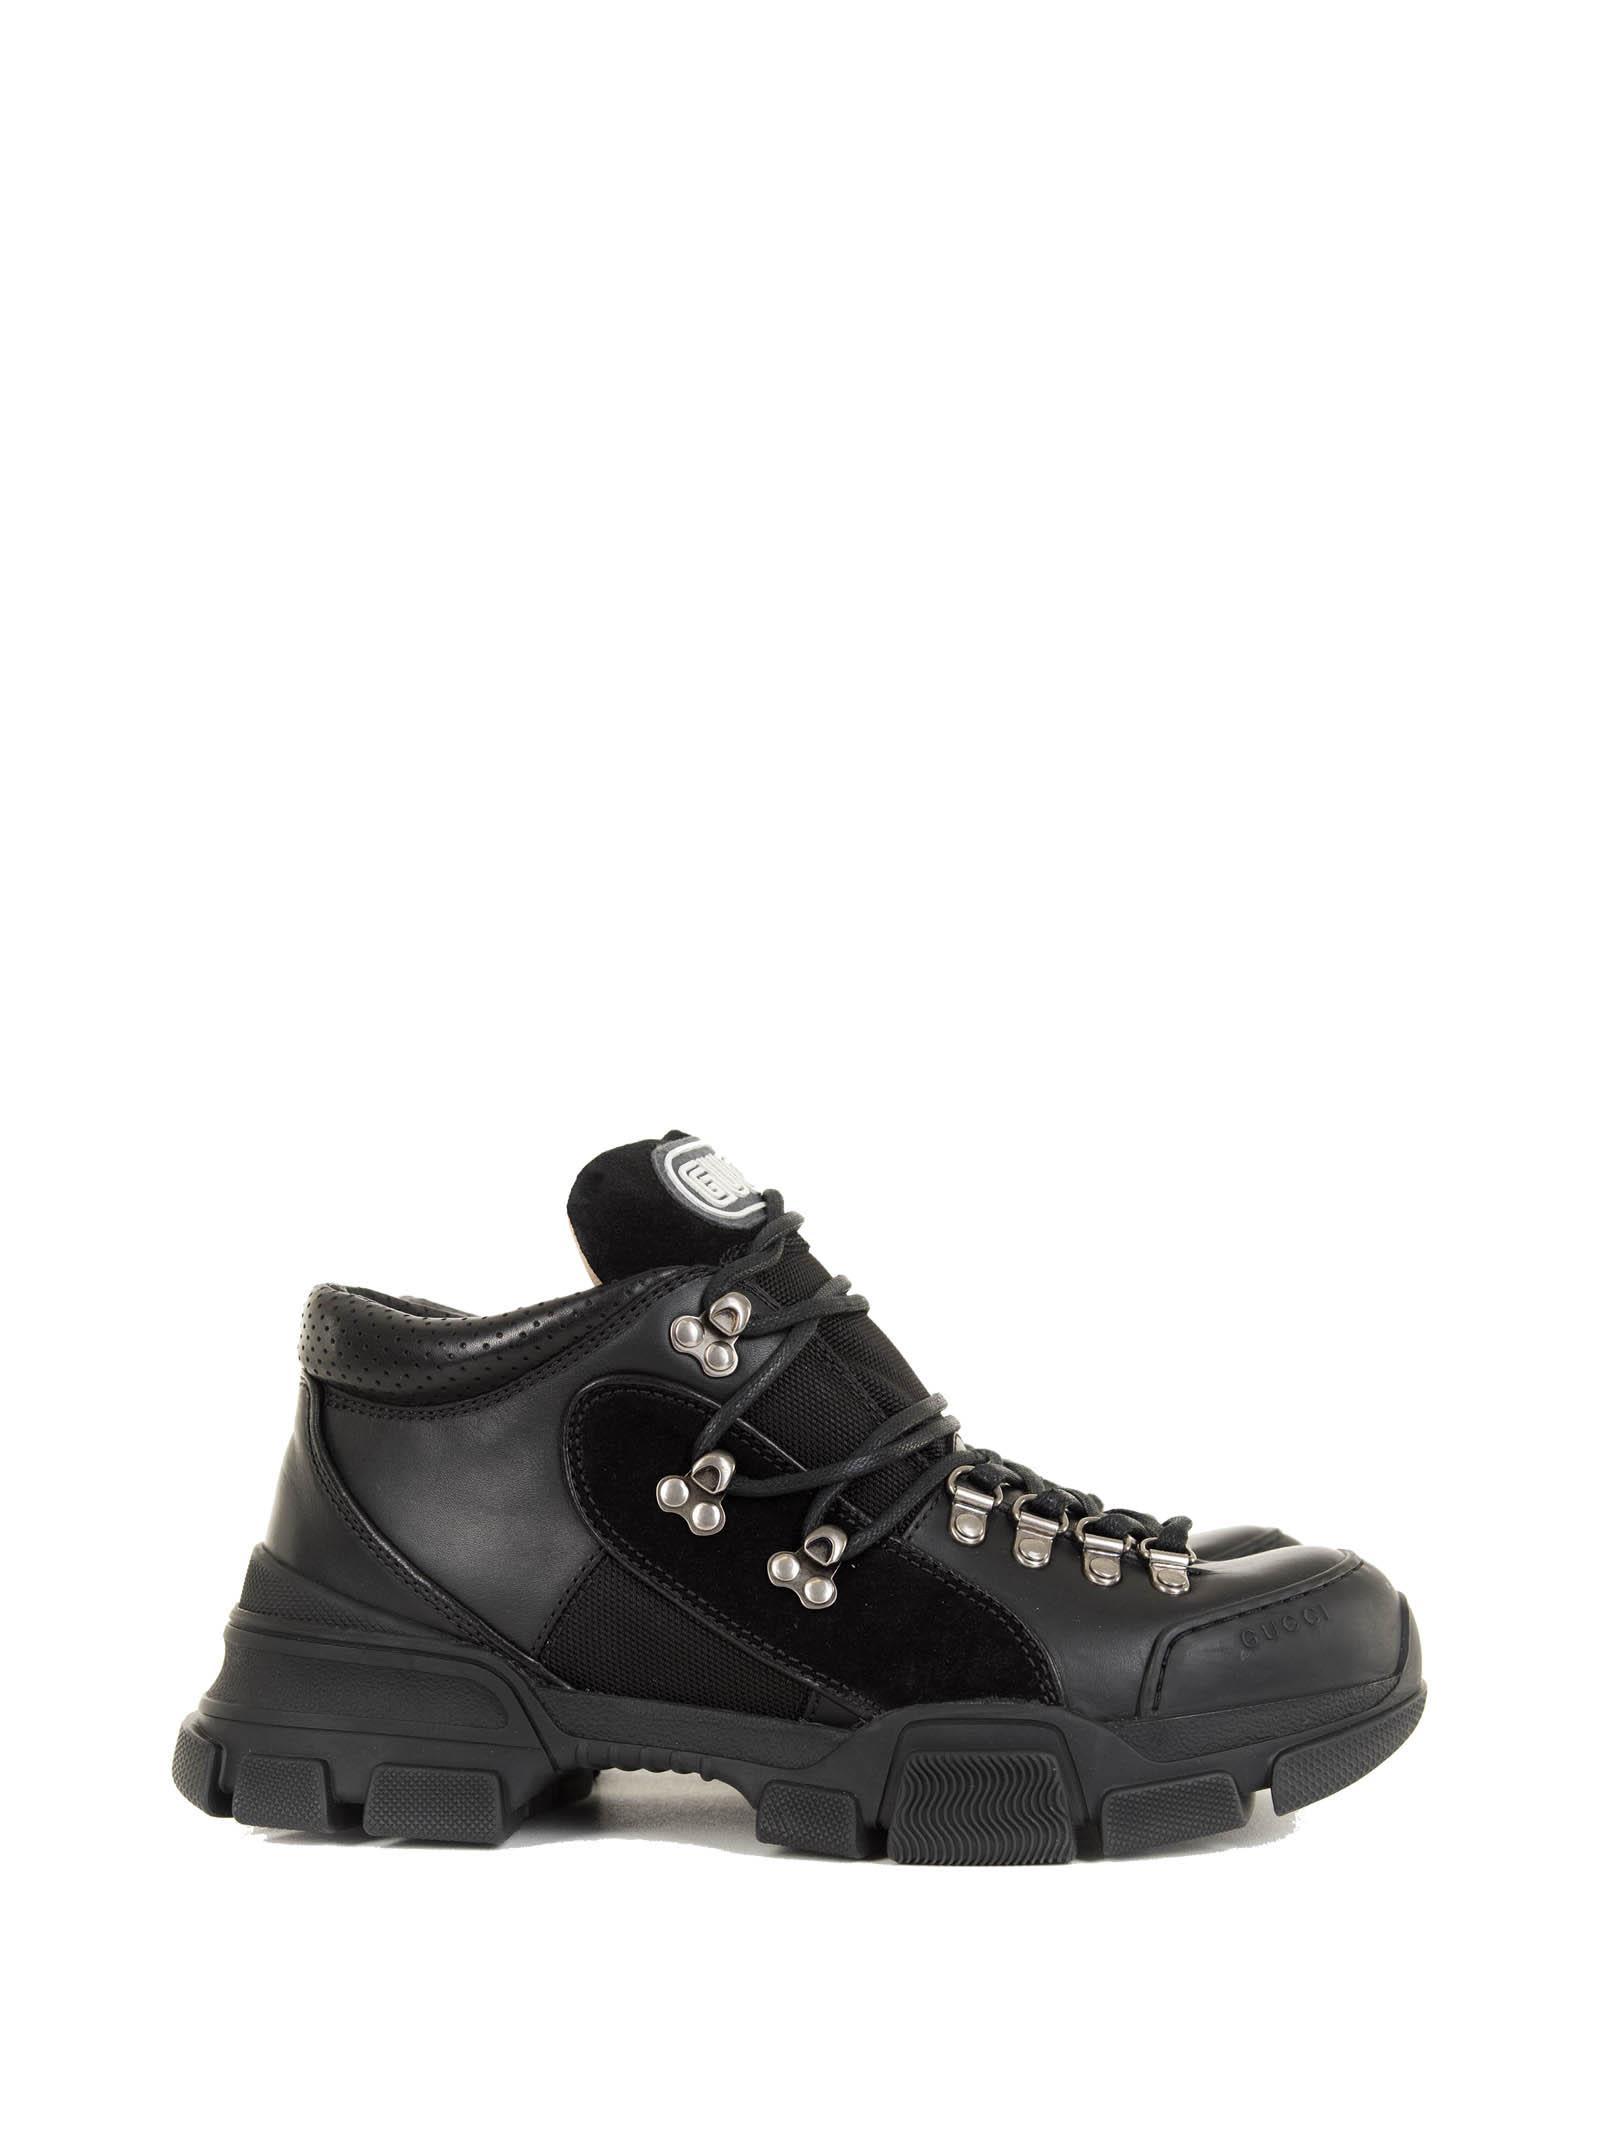 Gucci Black Leather Flashtrek